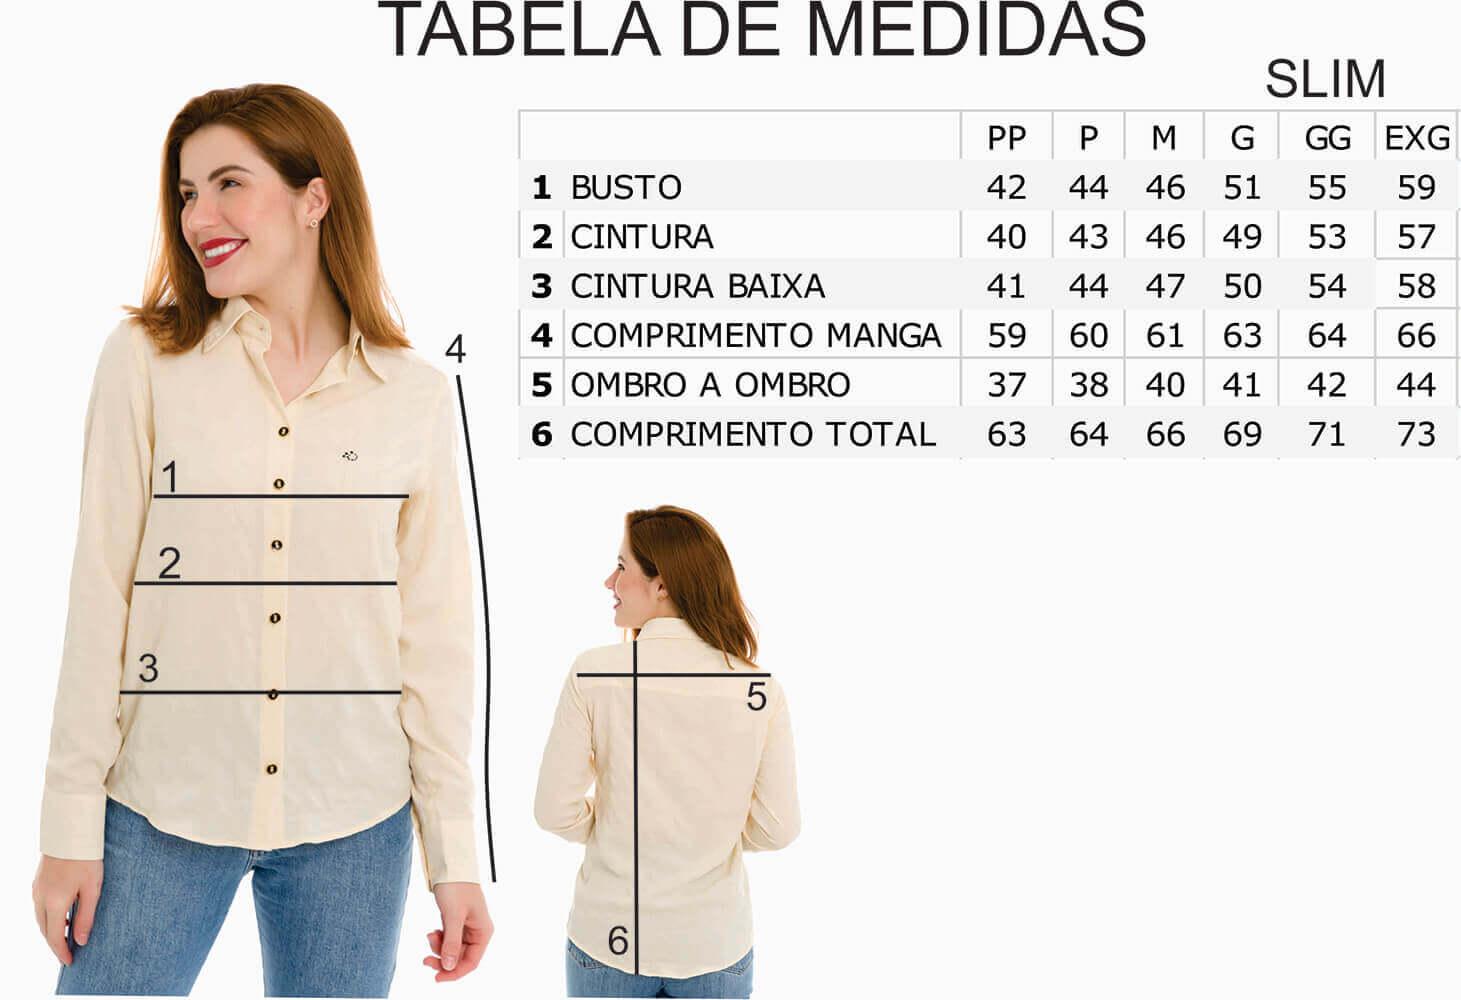 Camisa Camisete Feminino Olimpo Acetinada 100% Algodão Fio 80 Manga Longa